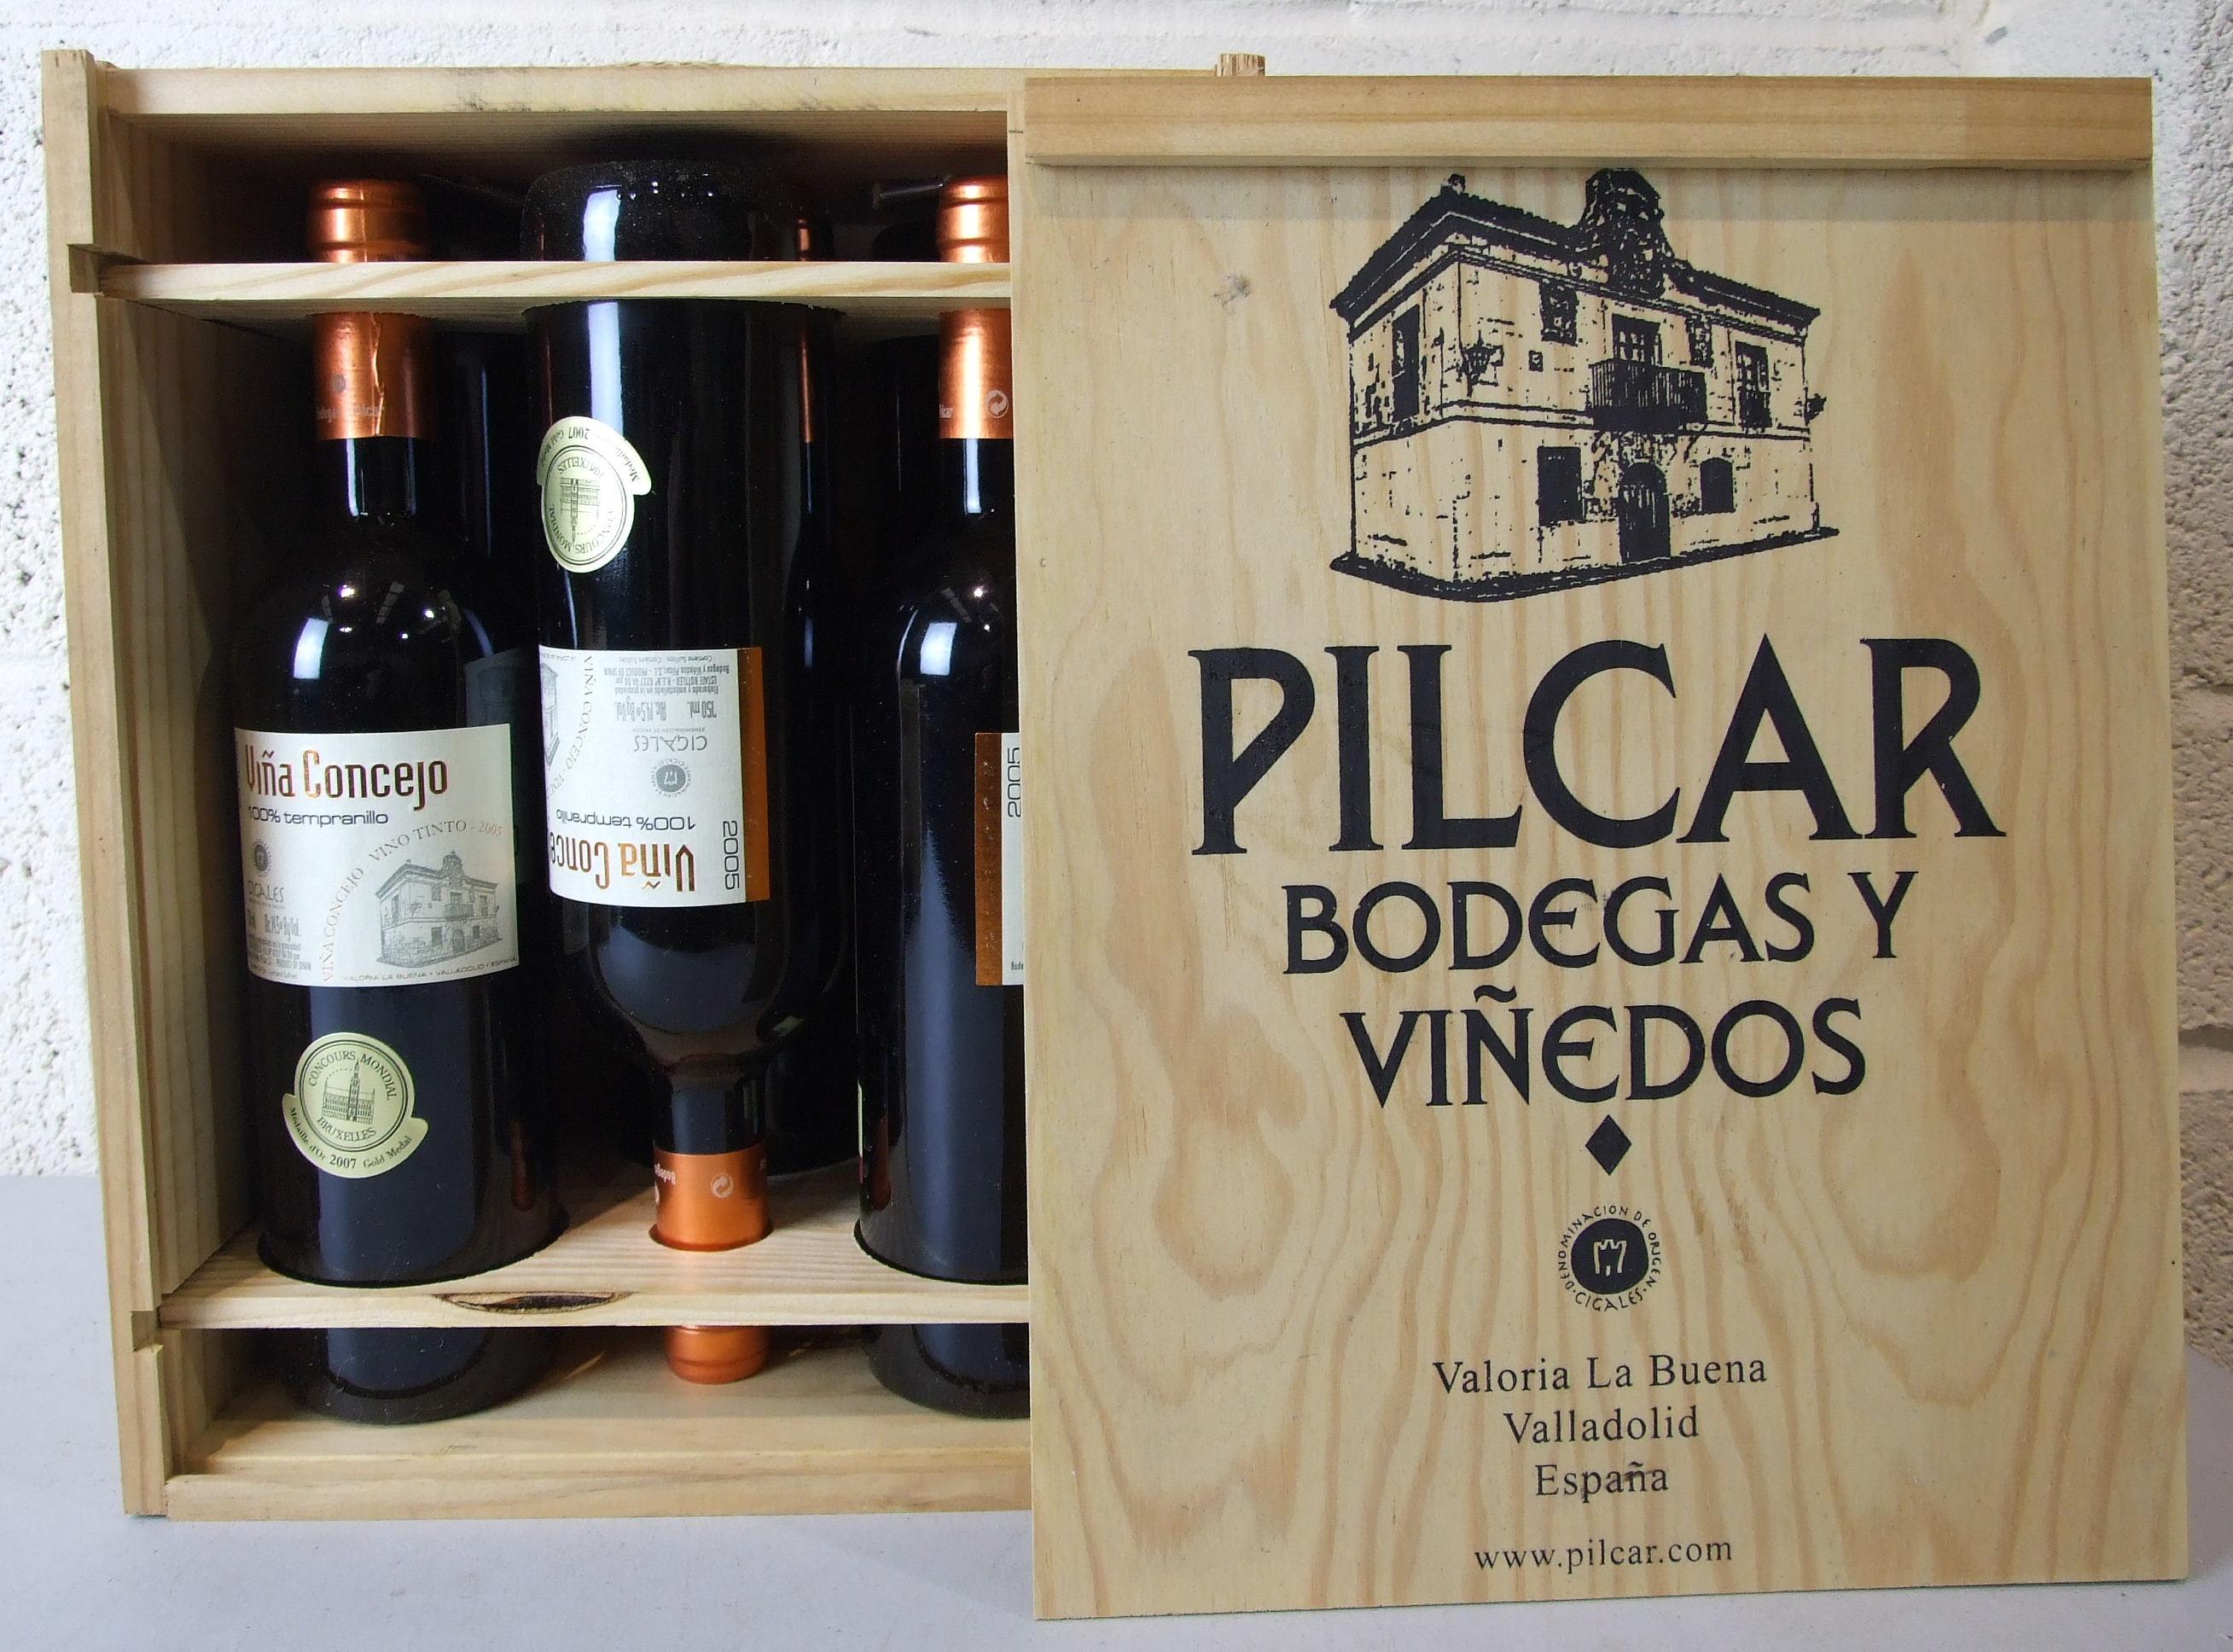 Lot 25 - Spain, Cigales Bodegas Pilcar 2005, six bottles, OWC, (6).